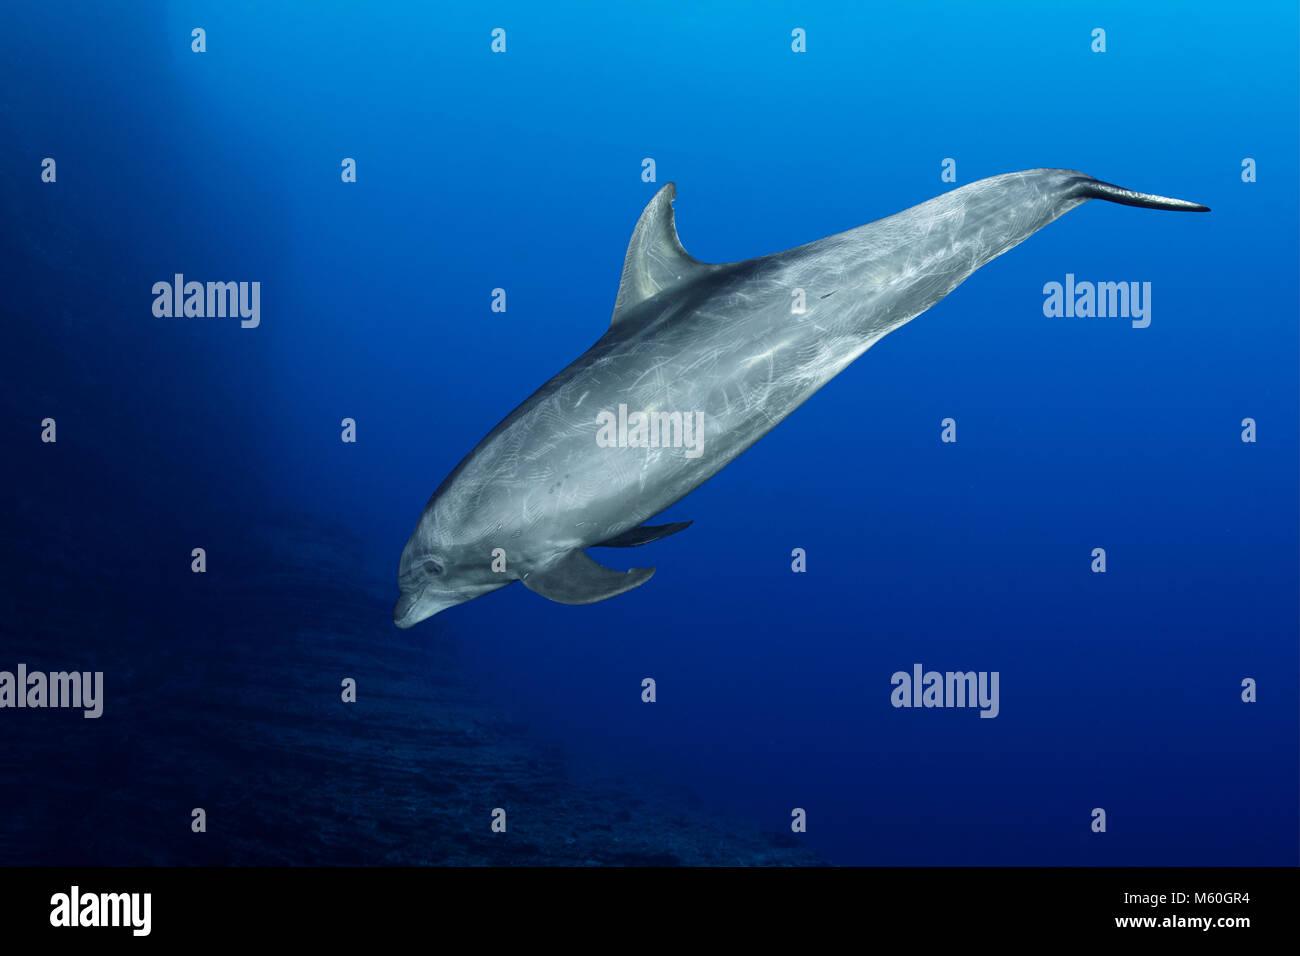 Bottlenose Dolphin, Tursiops truncatus, Roca Partida, Revillagigedo Islands, Mexico - Stock Image